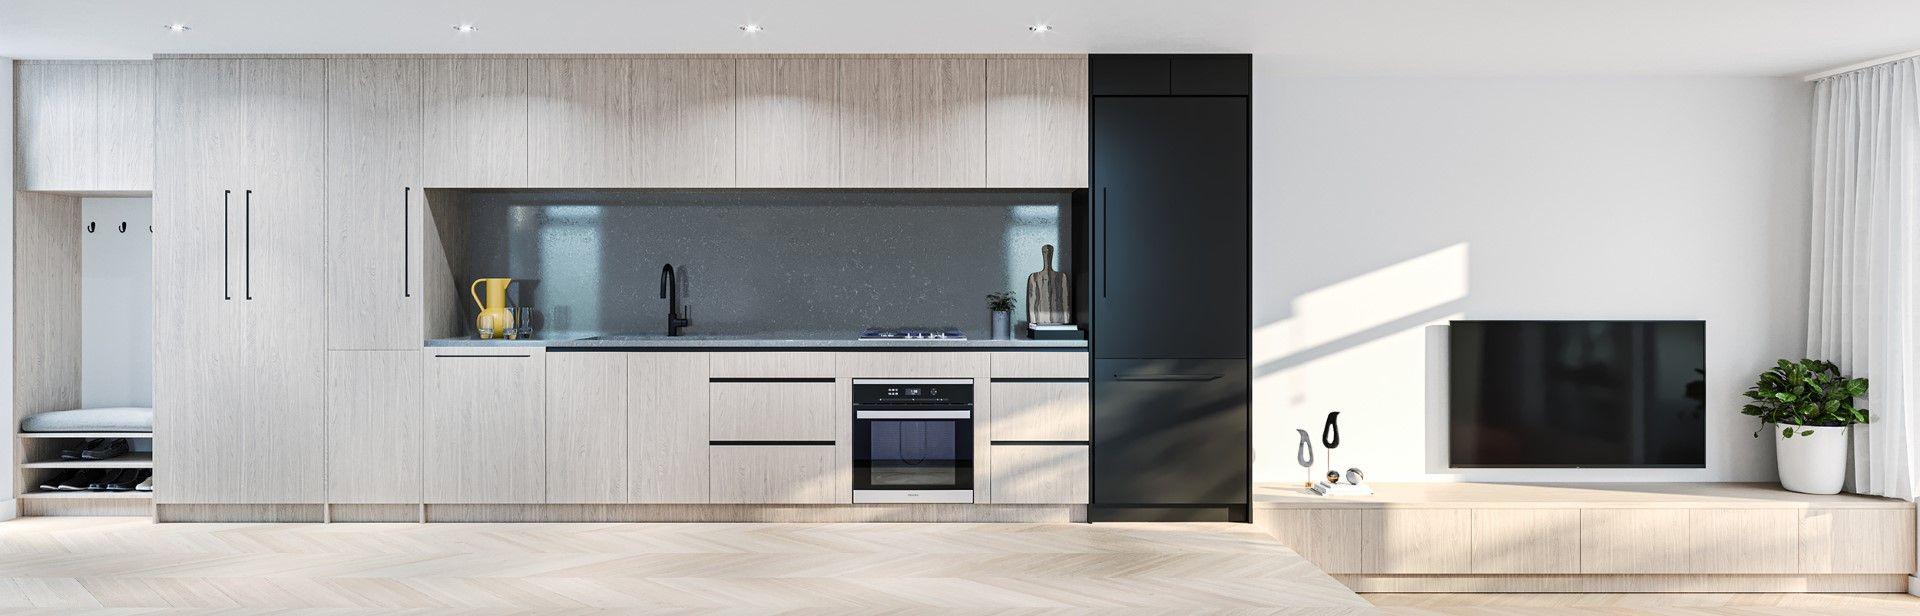 2020-05-14-oak52-kitchen-draft3-jpg-2500-large at 6778 Oak Street, Oakridge VW, Vancouver West